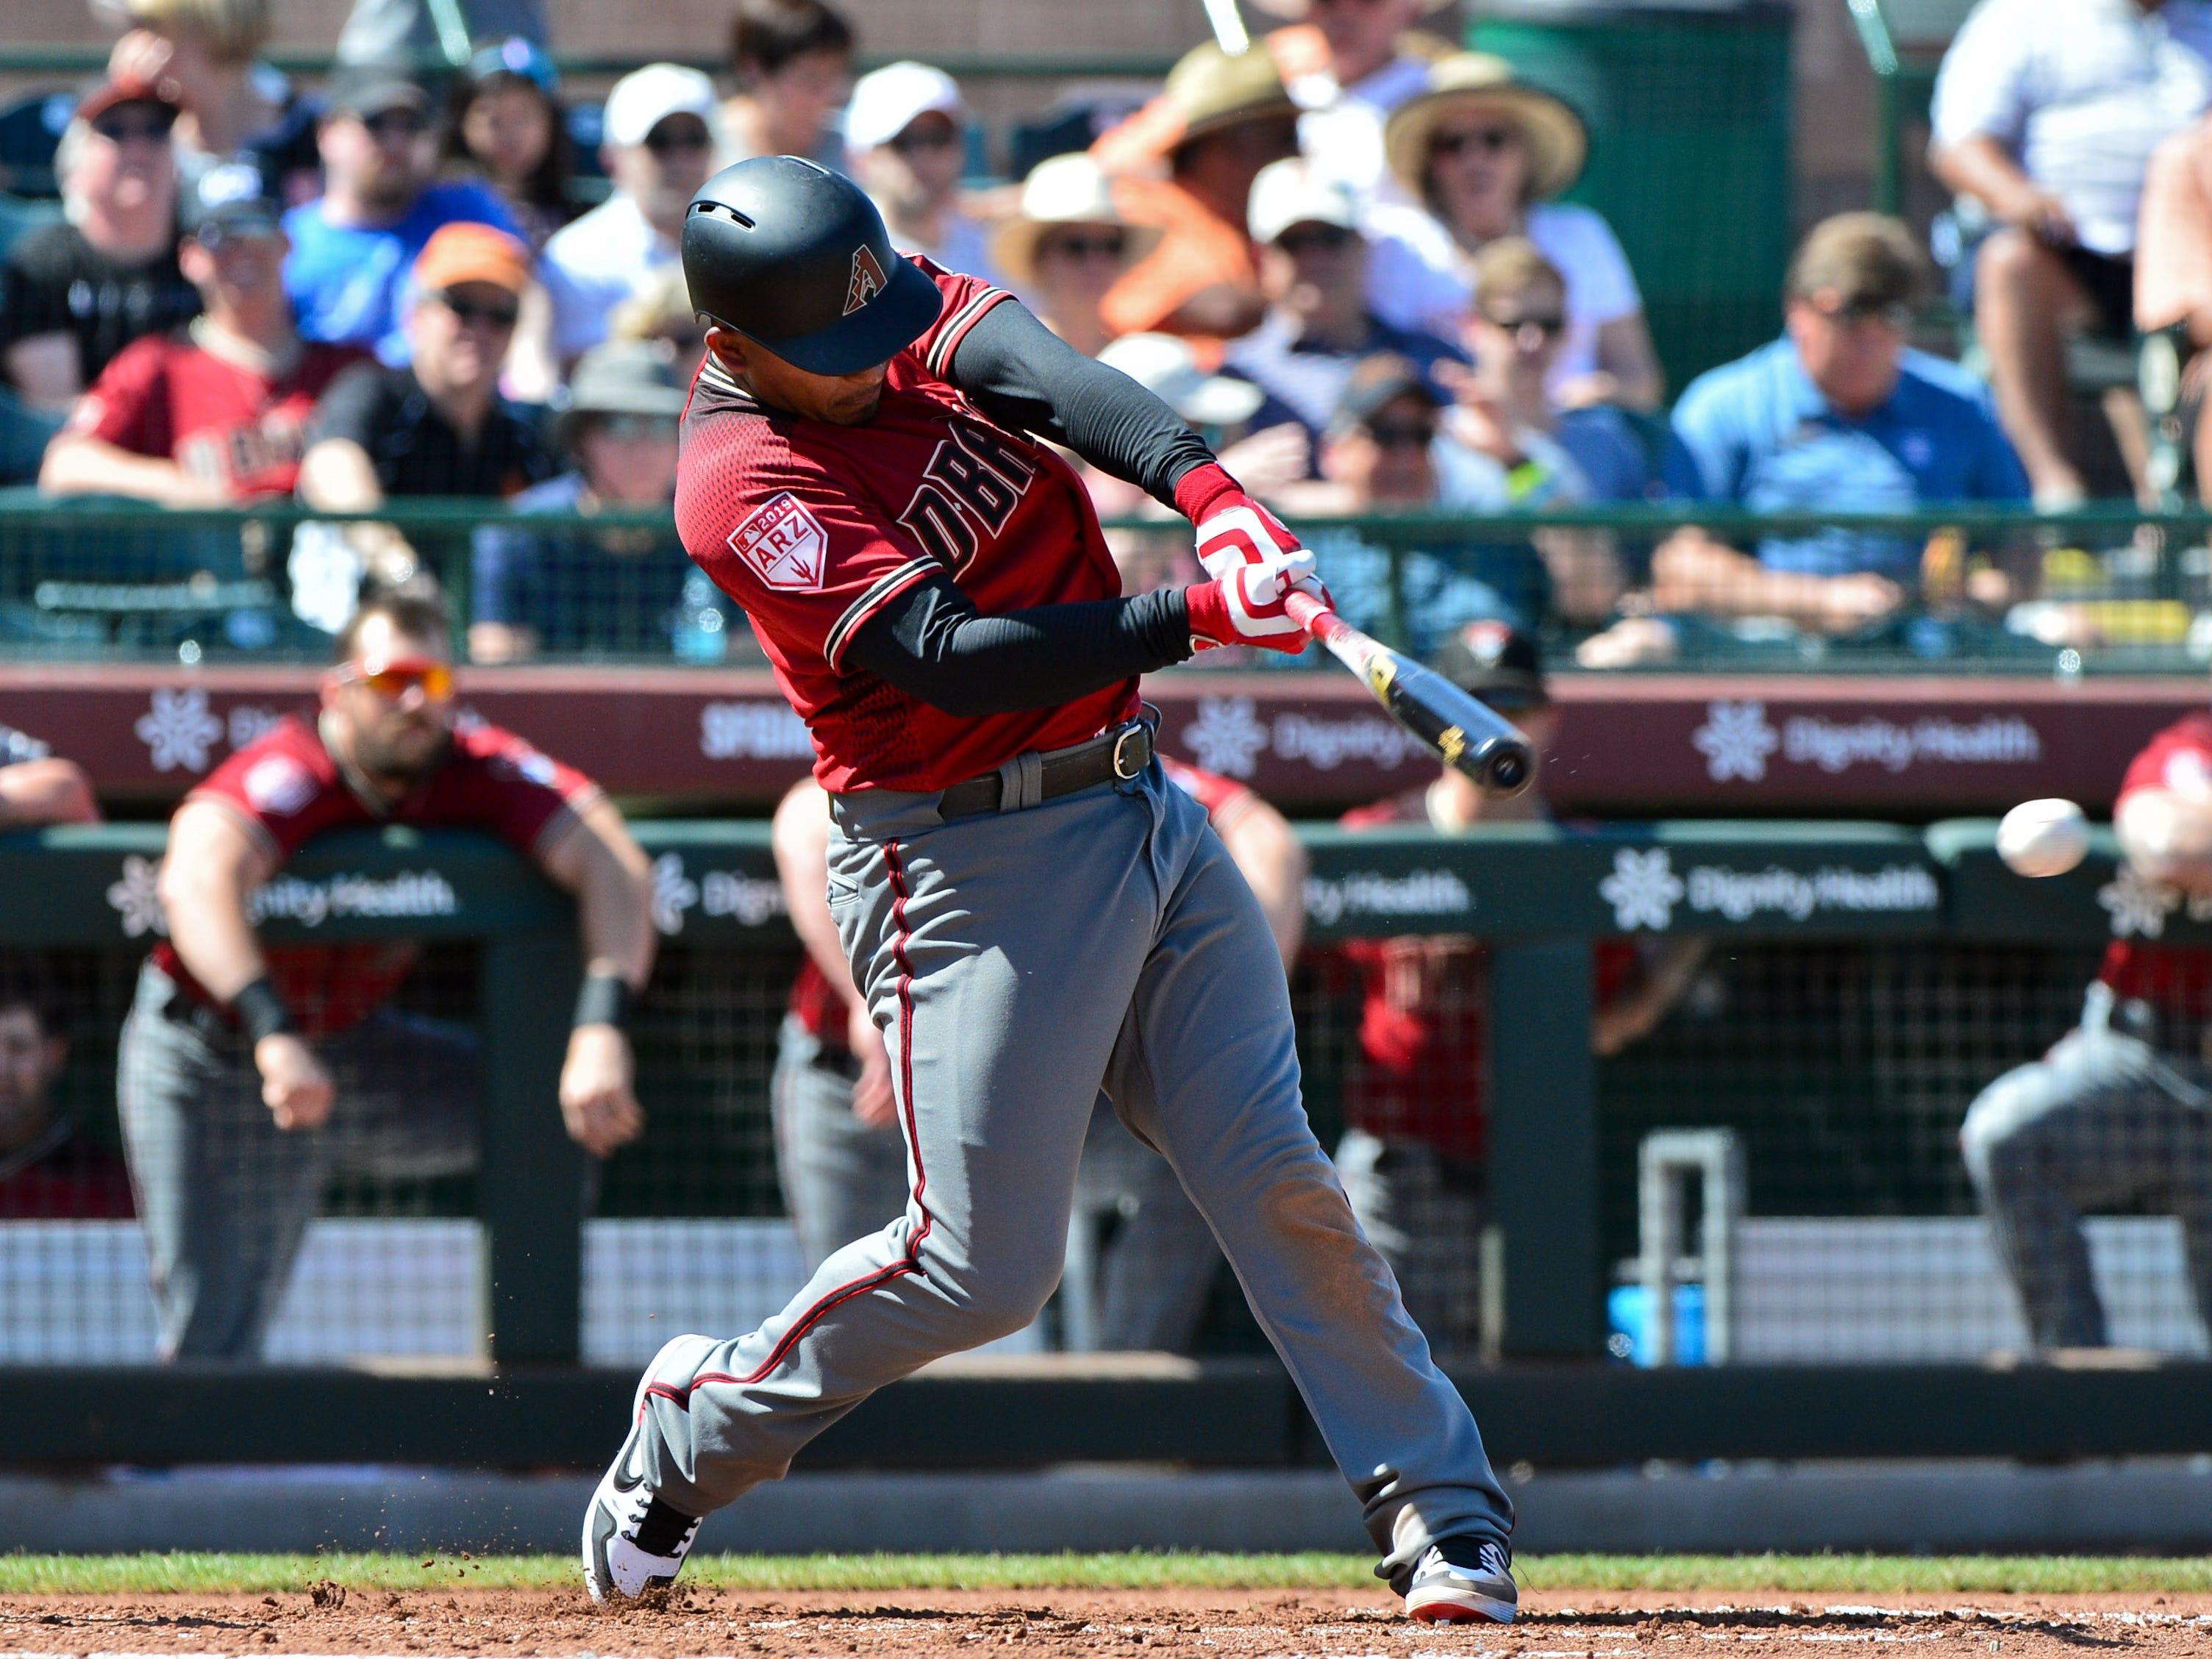 Mar 23, 2019; Scottsdale, AZ, USA; Arizona Diamondbacks third baseman Eduardo Escobar (5) singles in the third inning against the San Francisco Giants at Scottsdale Stadium.